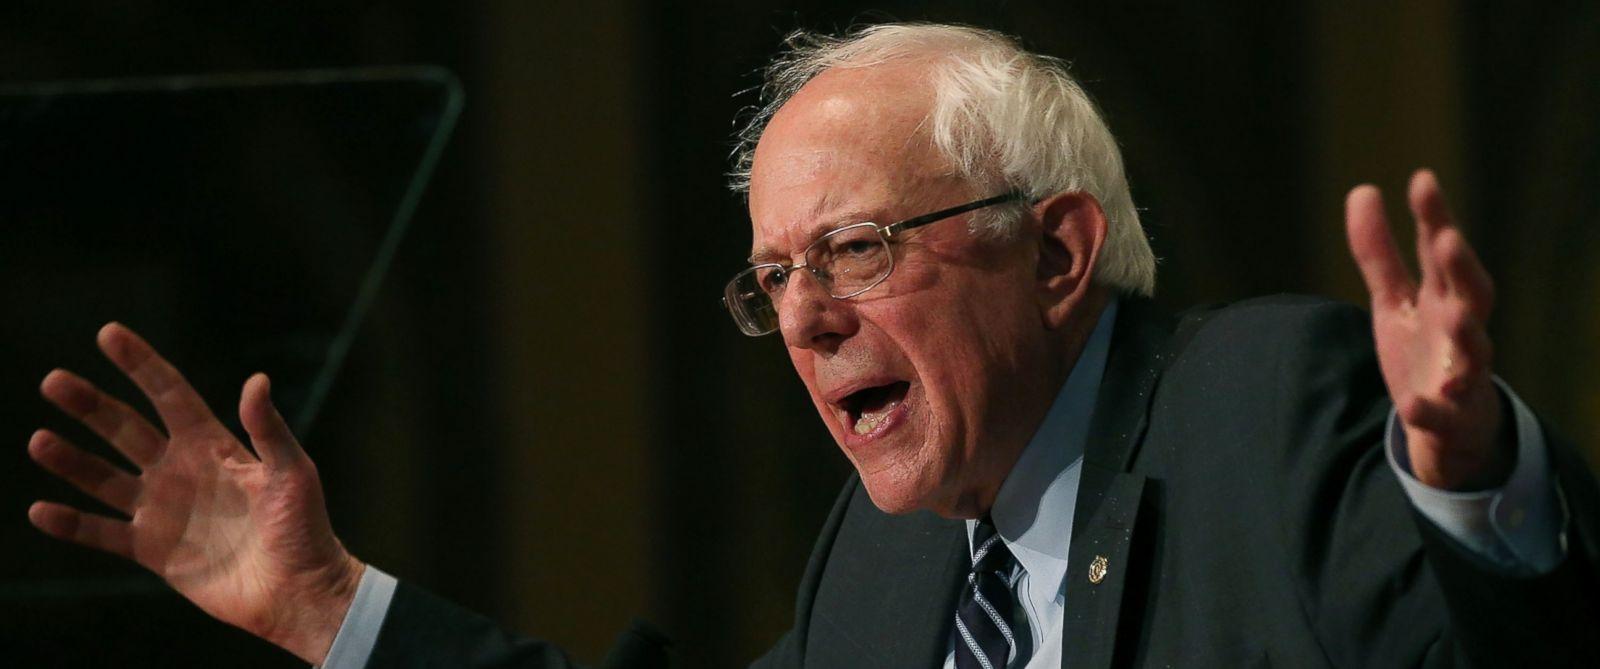 PHOTO: Democratic Presidential candidate Sen. Bernie Sanders speaks about combating ISIS and democratic socialism at Georgetown University Nov. 19, 2015 in Washington.